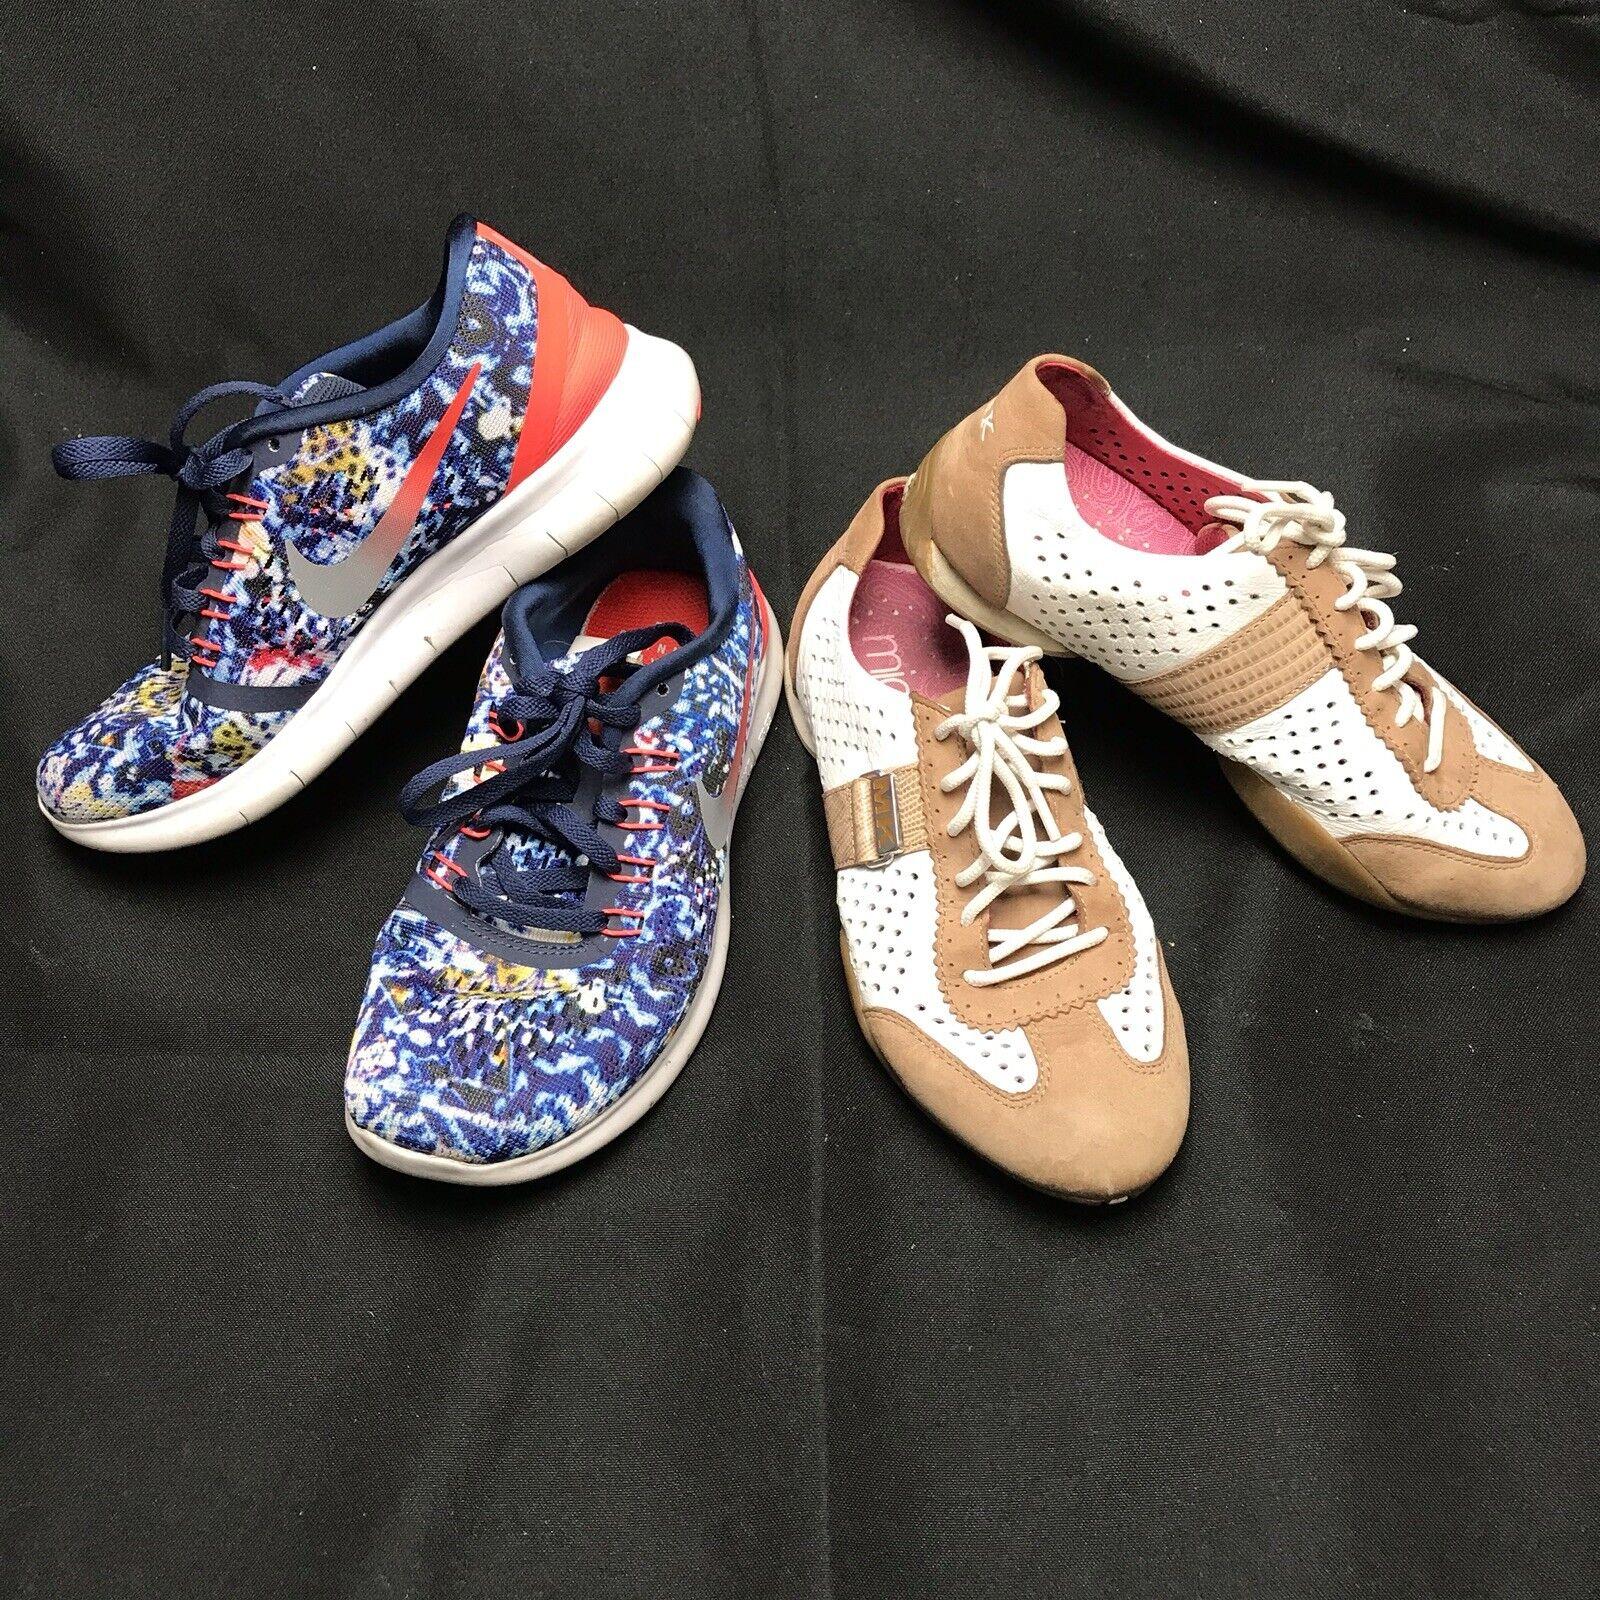 Lot 2 Womens 5 EU 35.5 35 Sneakers Inc Nike Running 849810 & Michelle K Leather